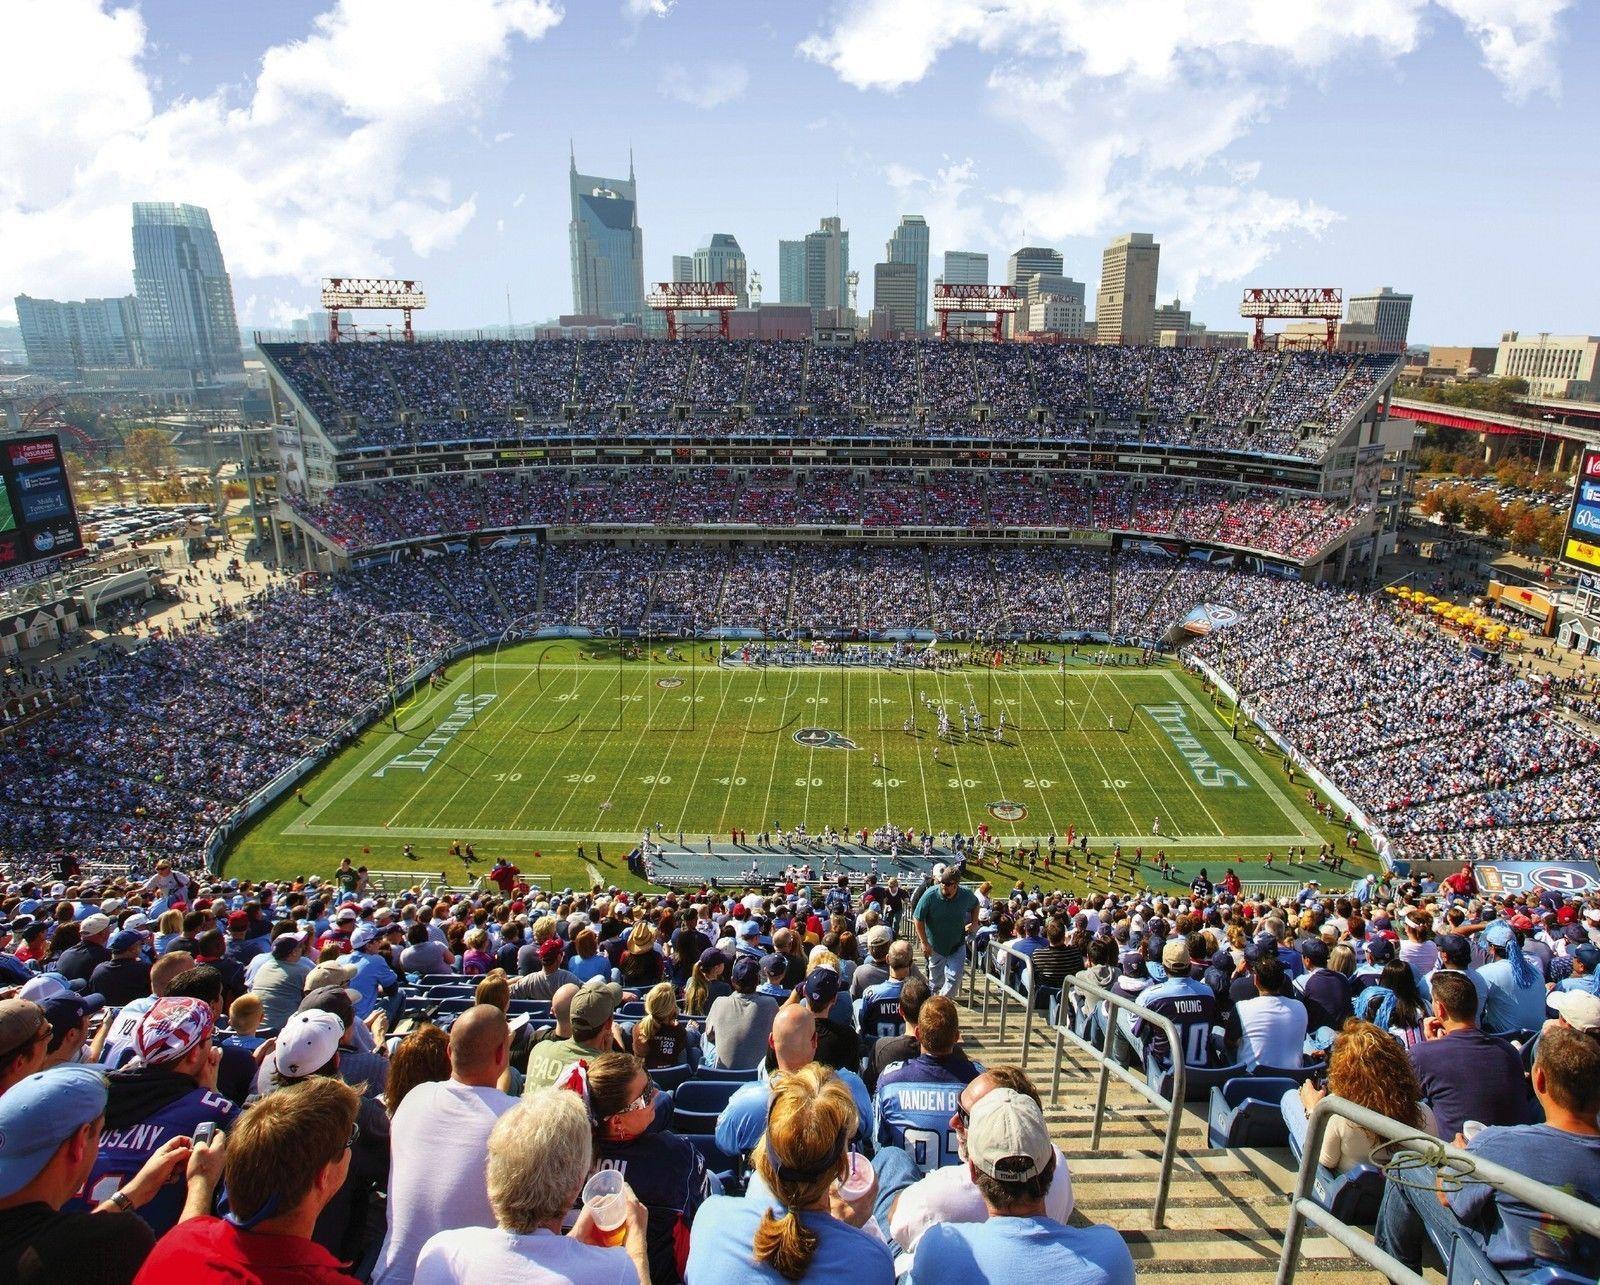 Tennessee Titans Lp Field 50 Yard Line Nashville View Nfl Football 8x10 Photo Tennessee Titans 8x10 Photo Nfl Football